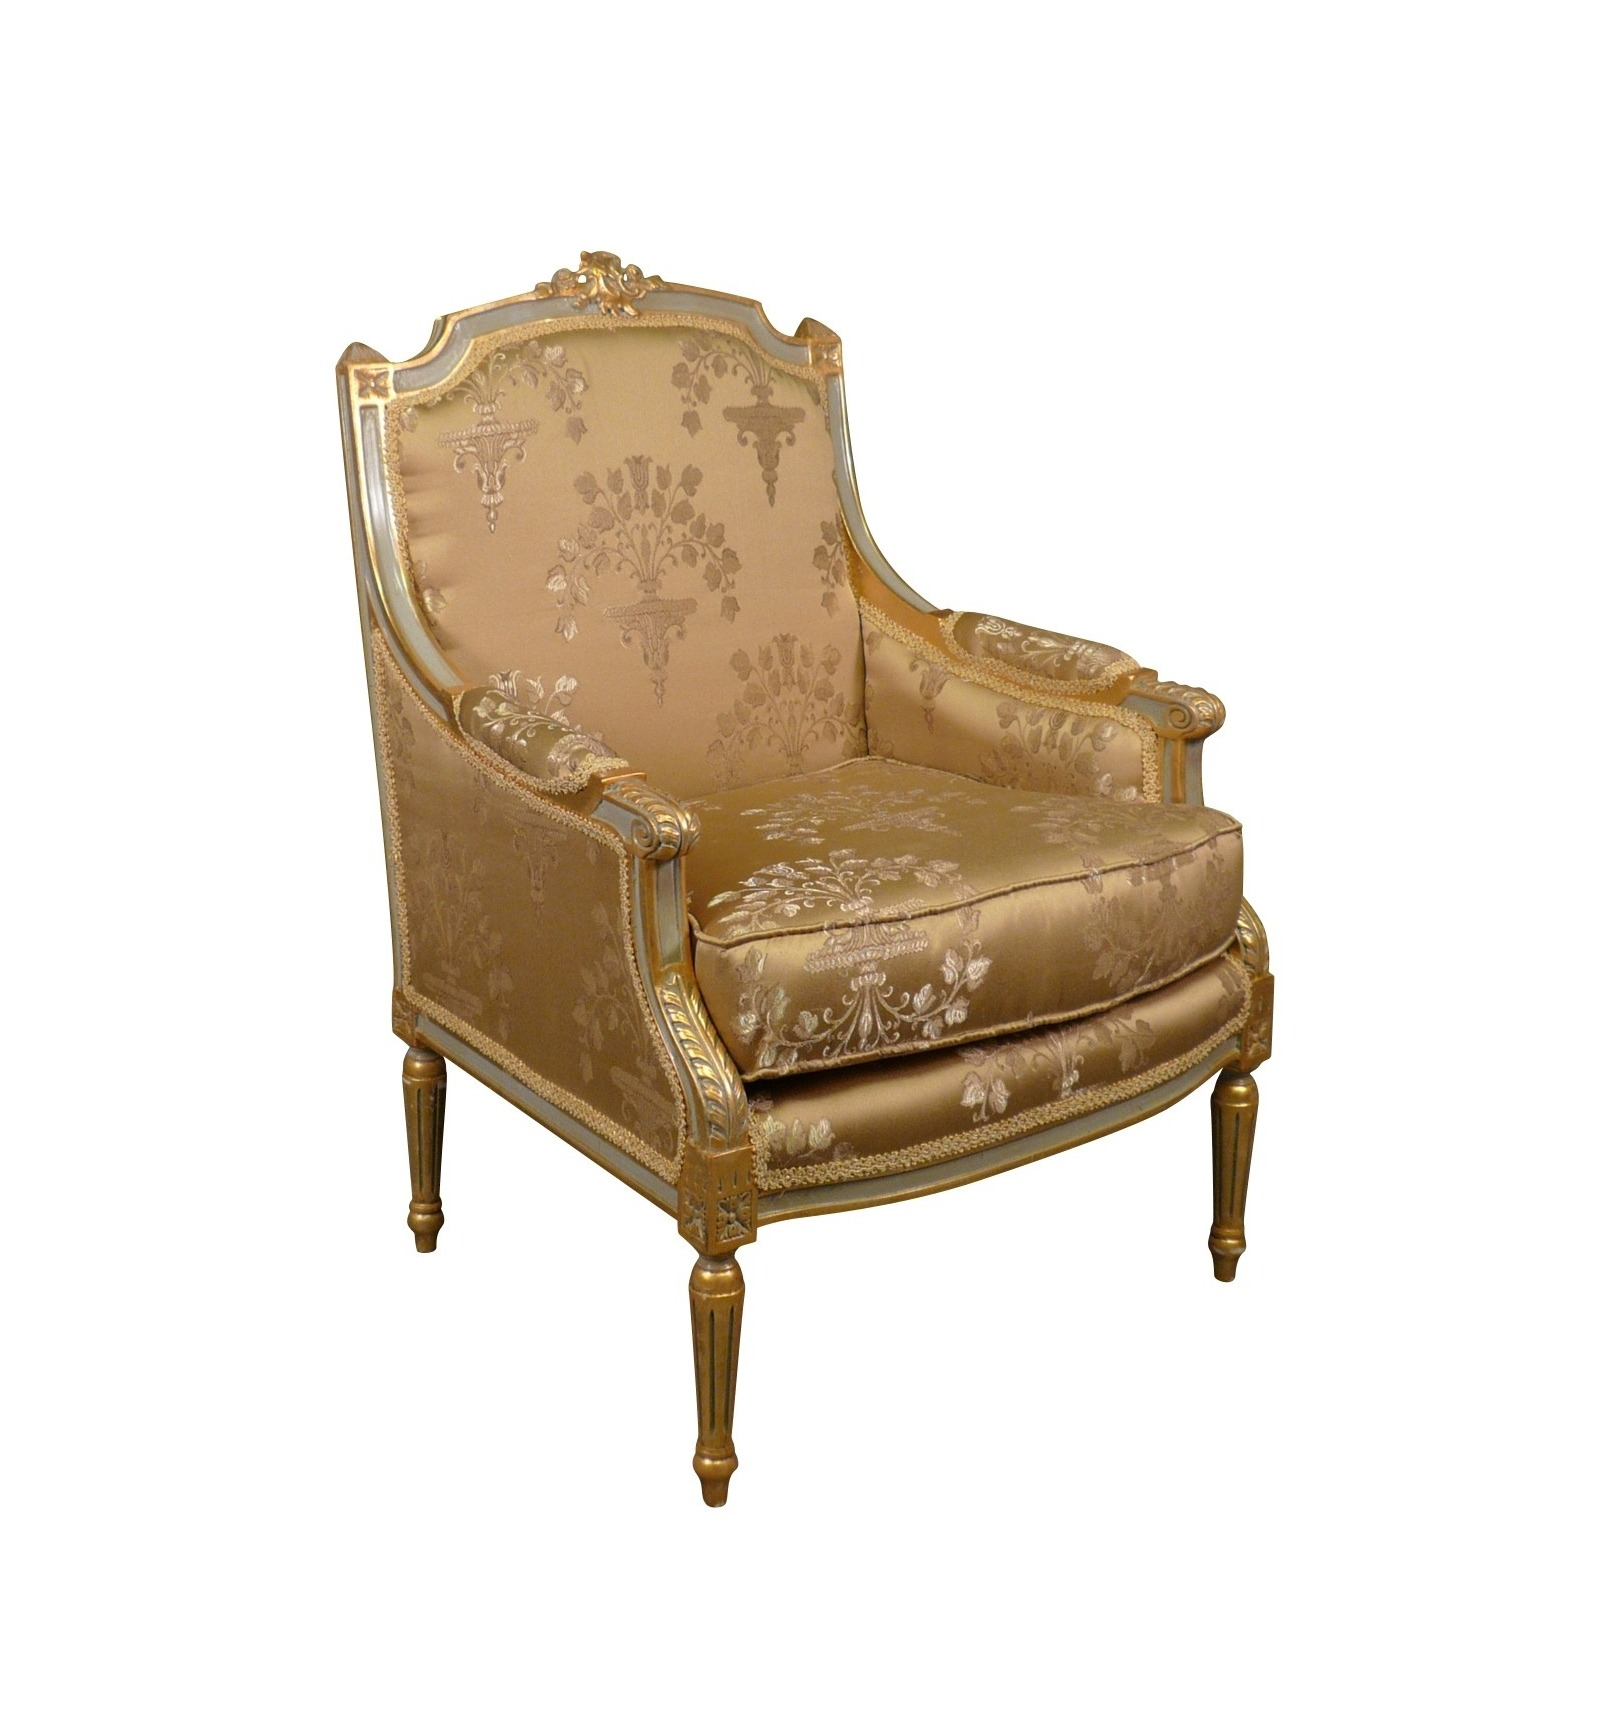 berg re louis xvi. Black Bedroom Furniture Sets. Home Design Ideas